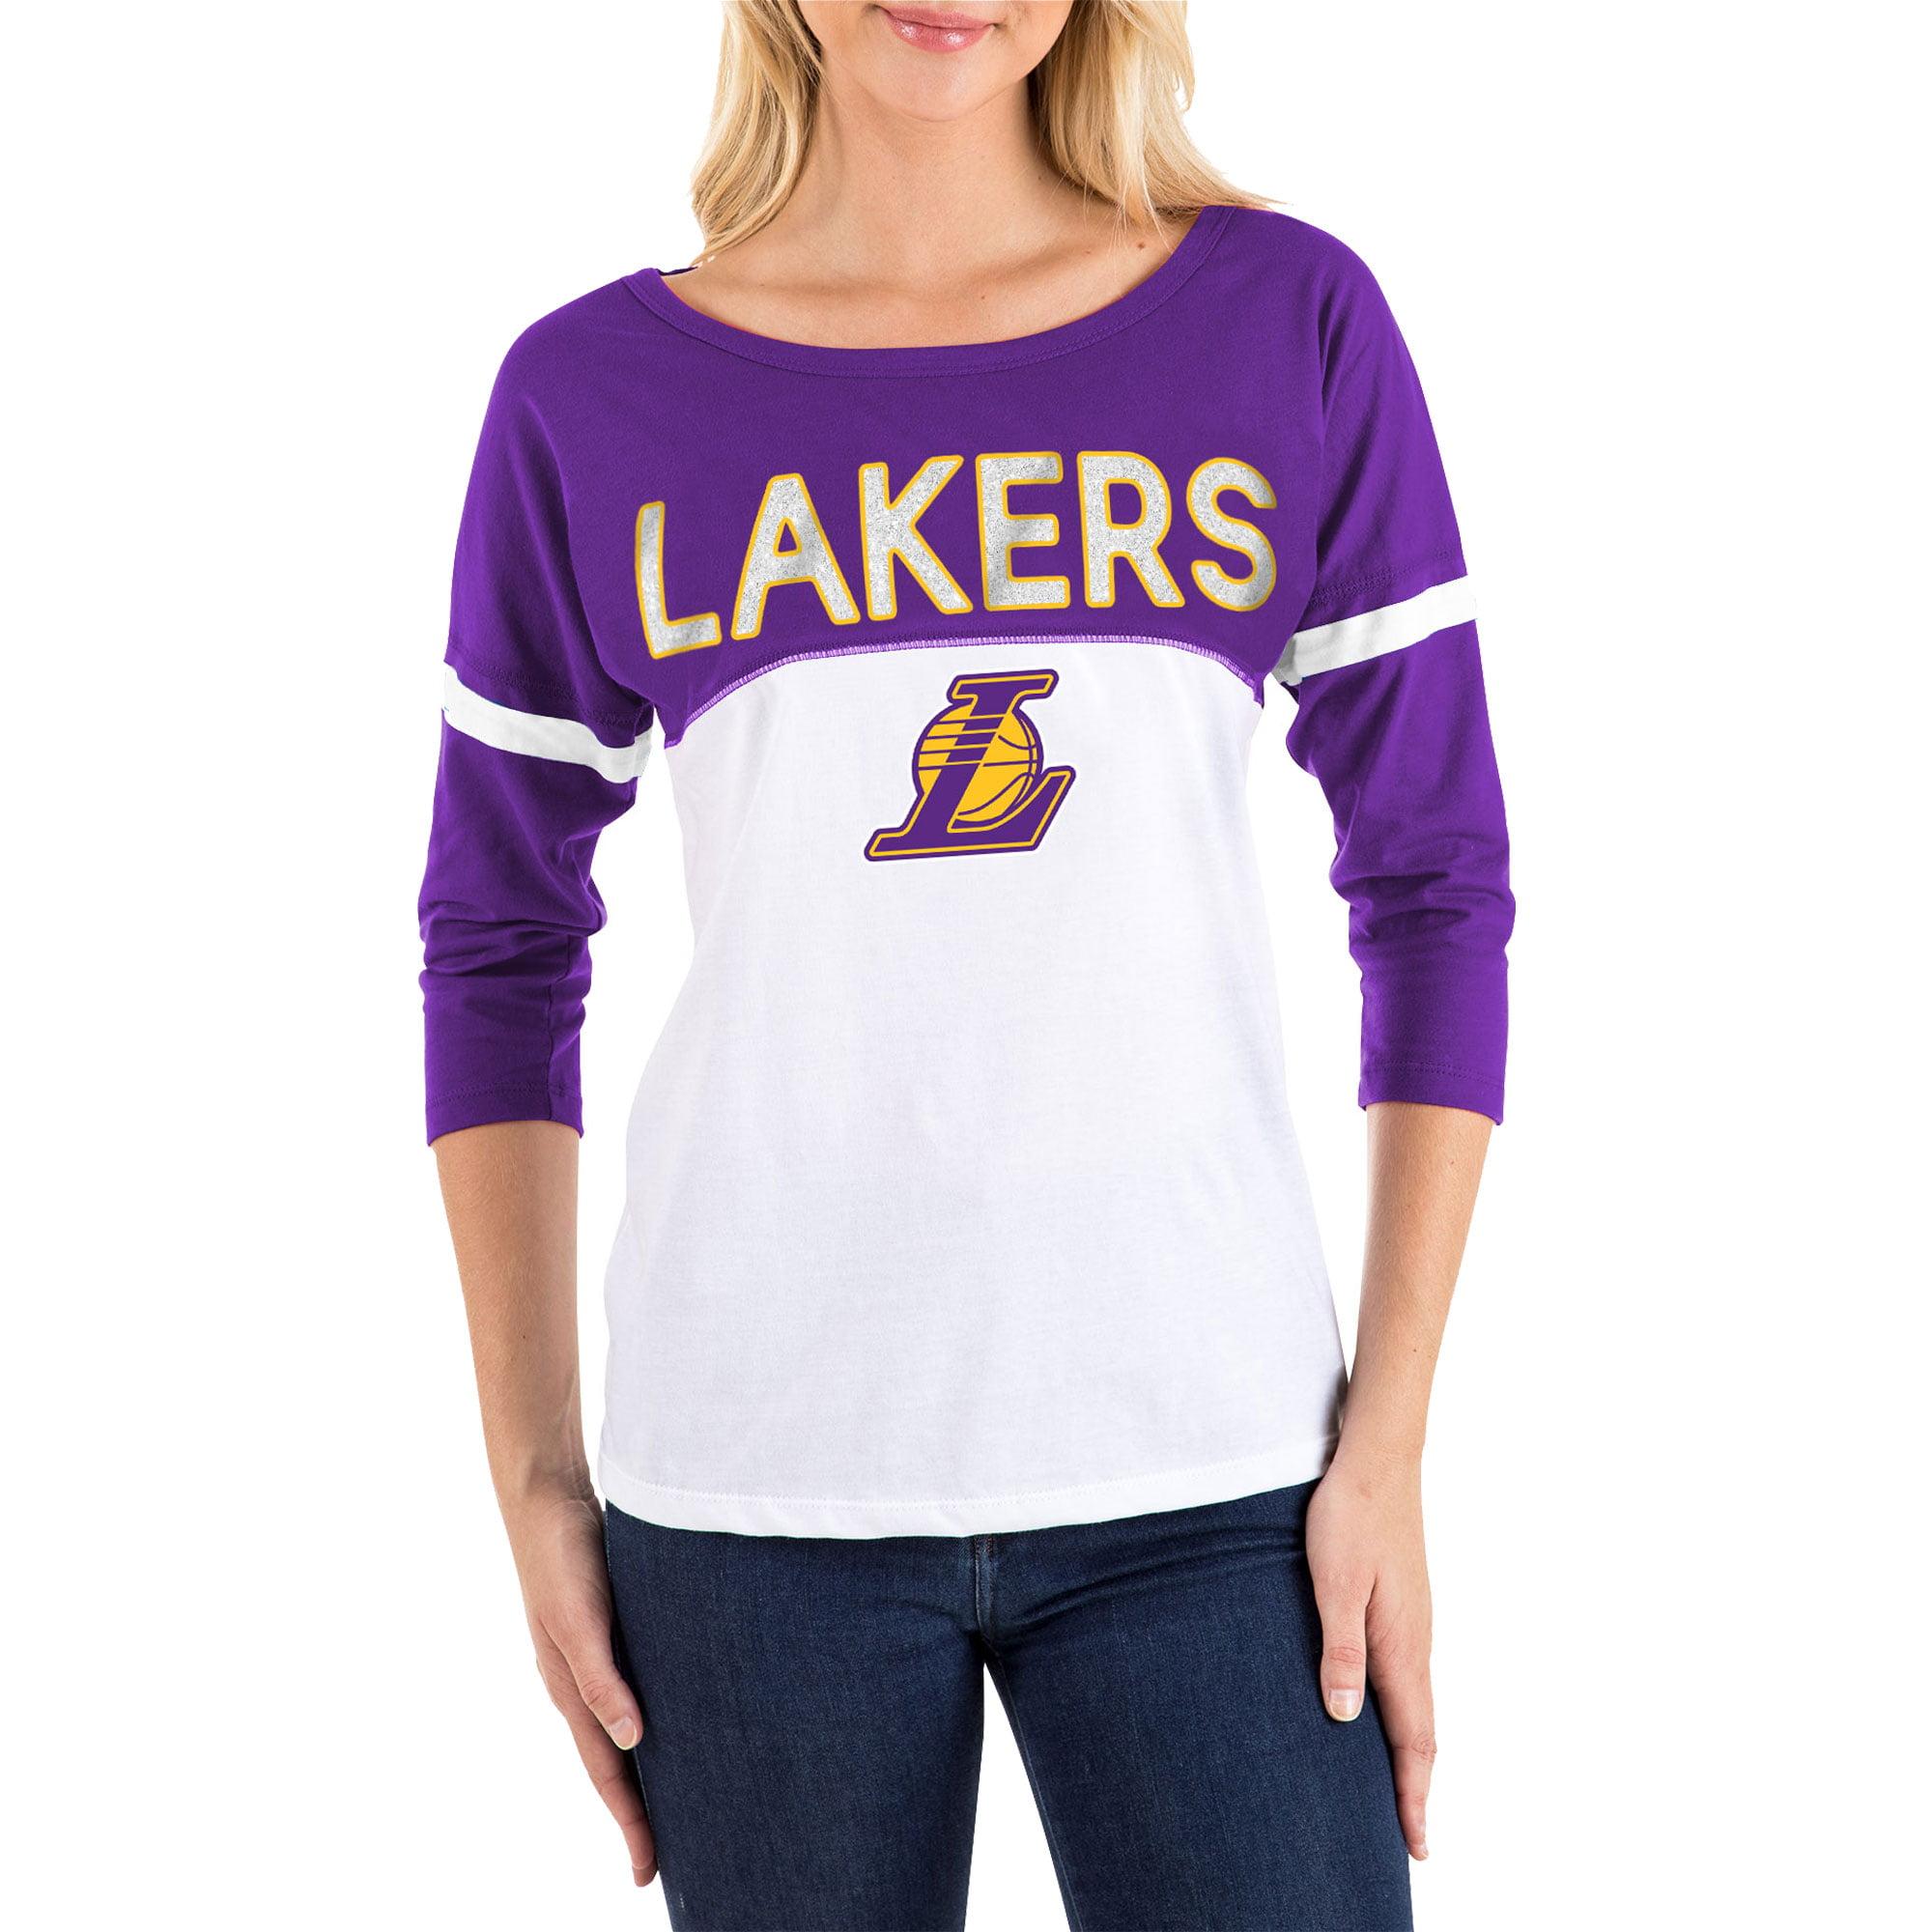 Women's New Era White/Purple Los Angeles Lakers 3/4-Sleeve T-Shirt